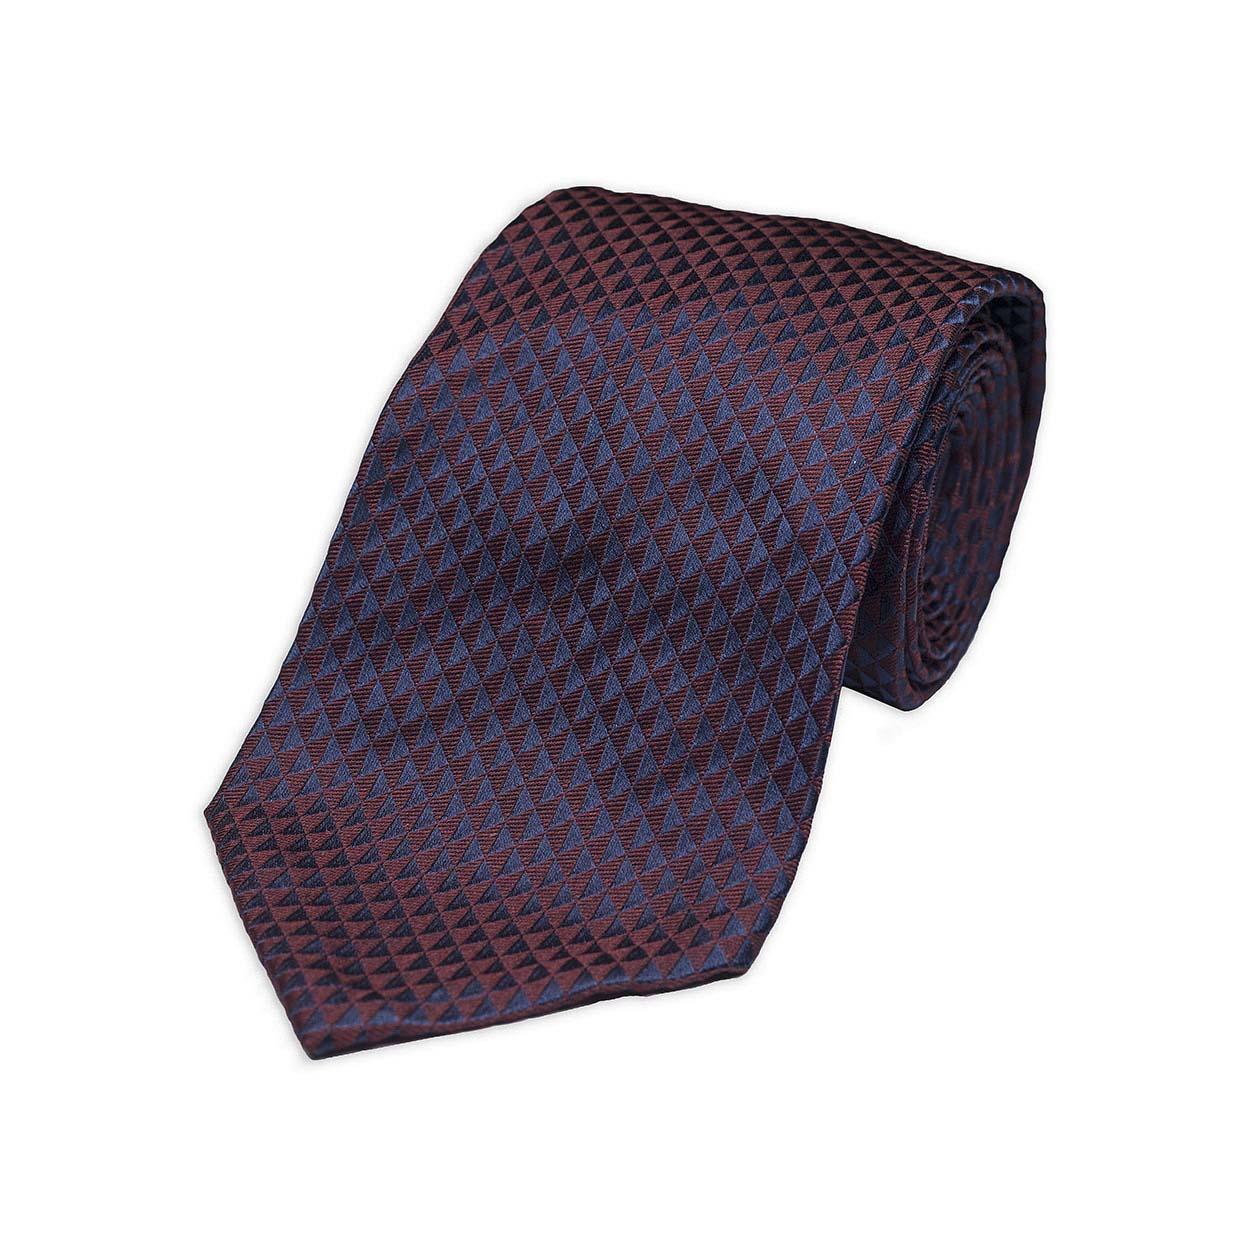 kydos styleforum holiday office party burgundy jacquard tie